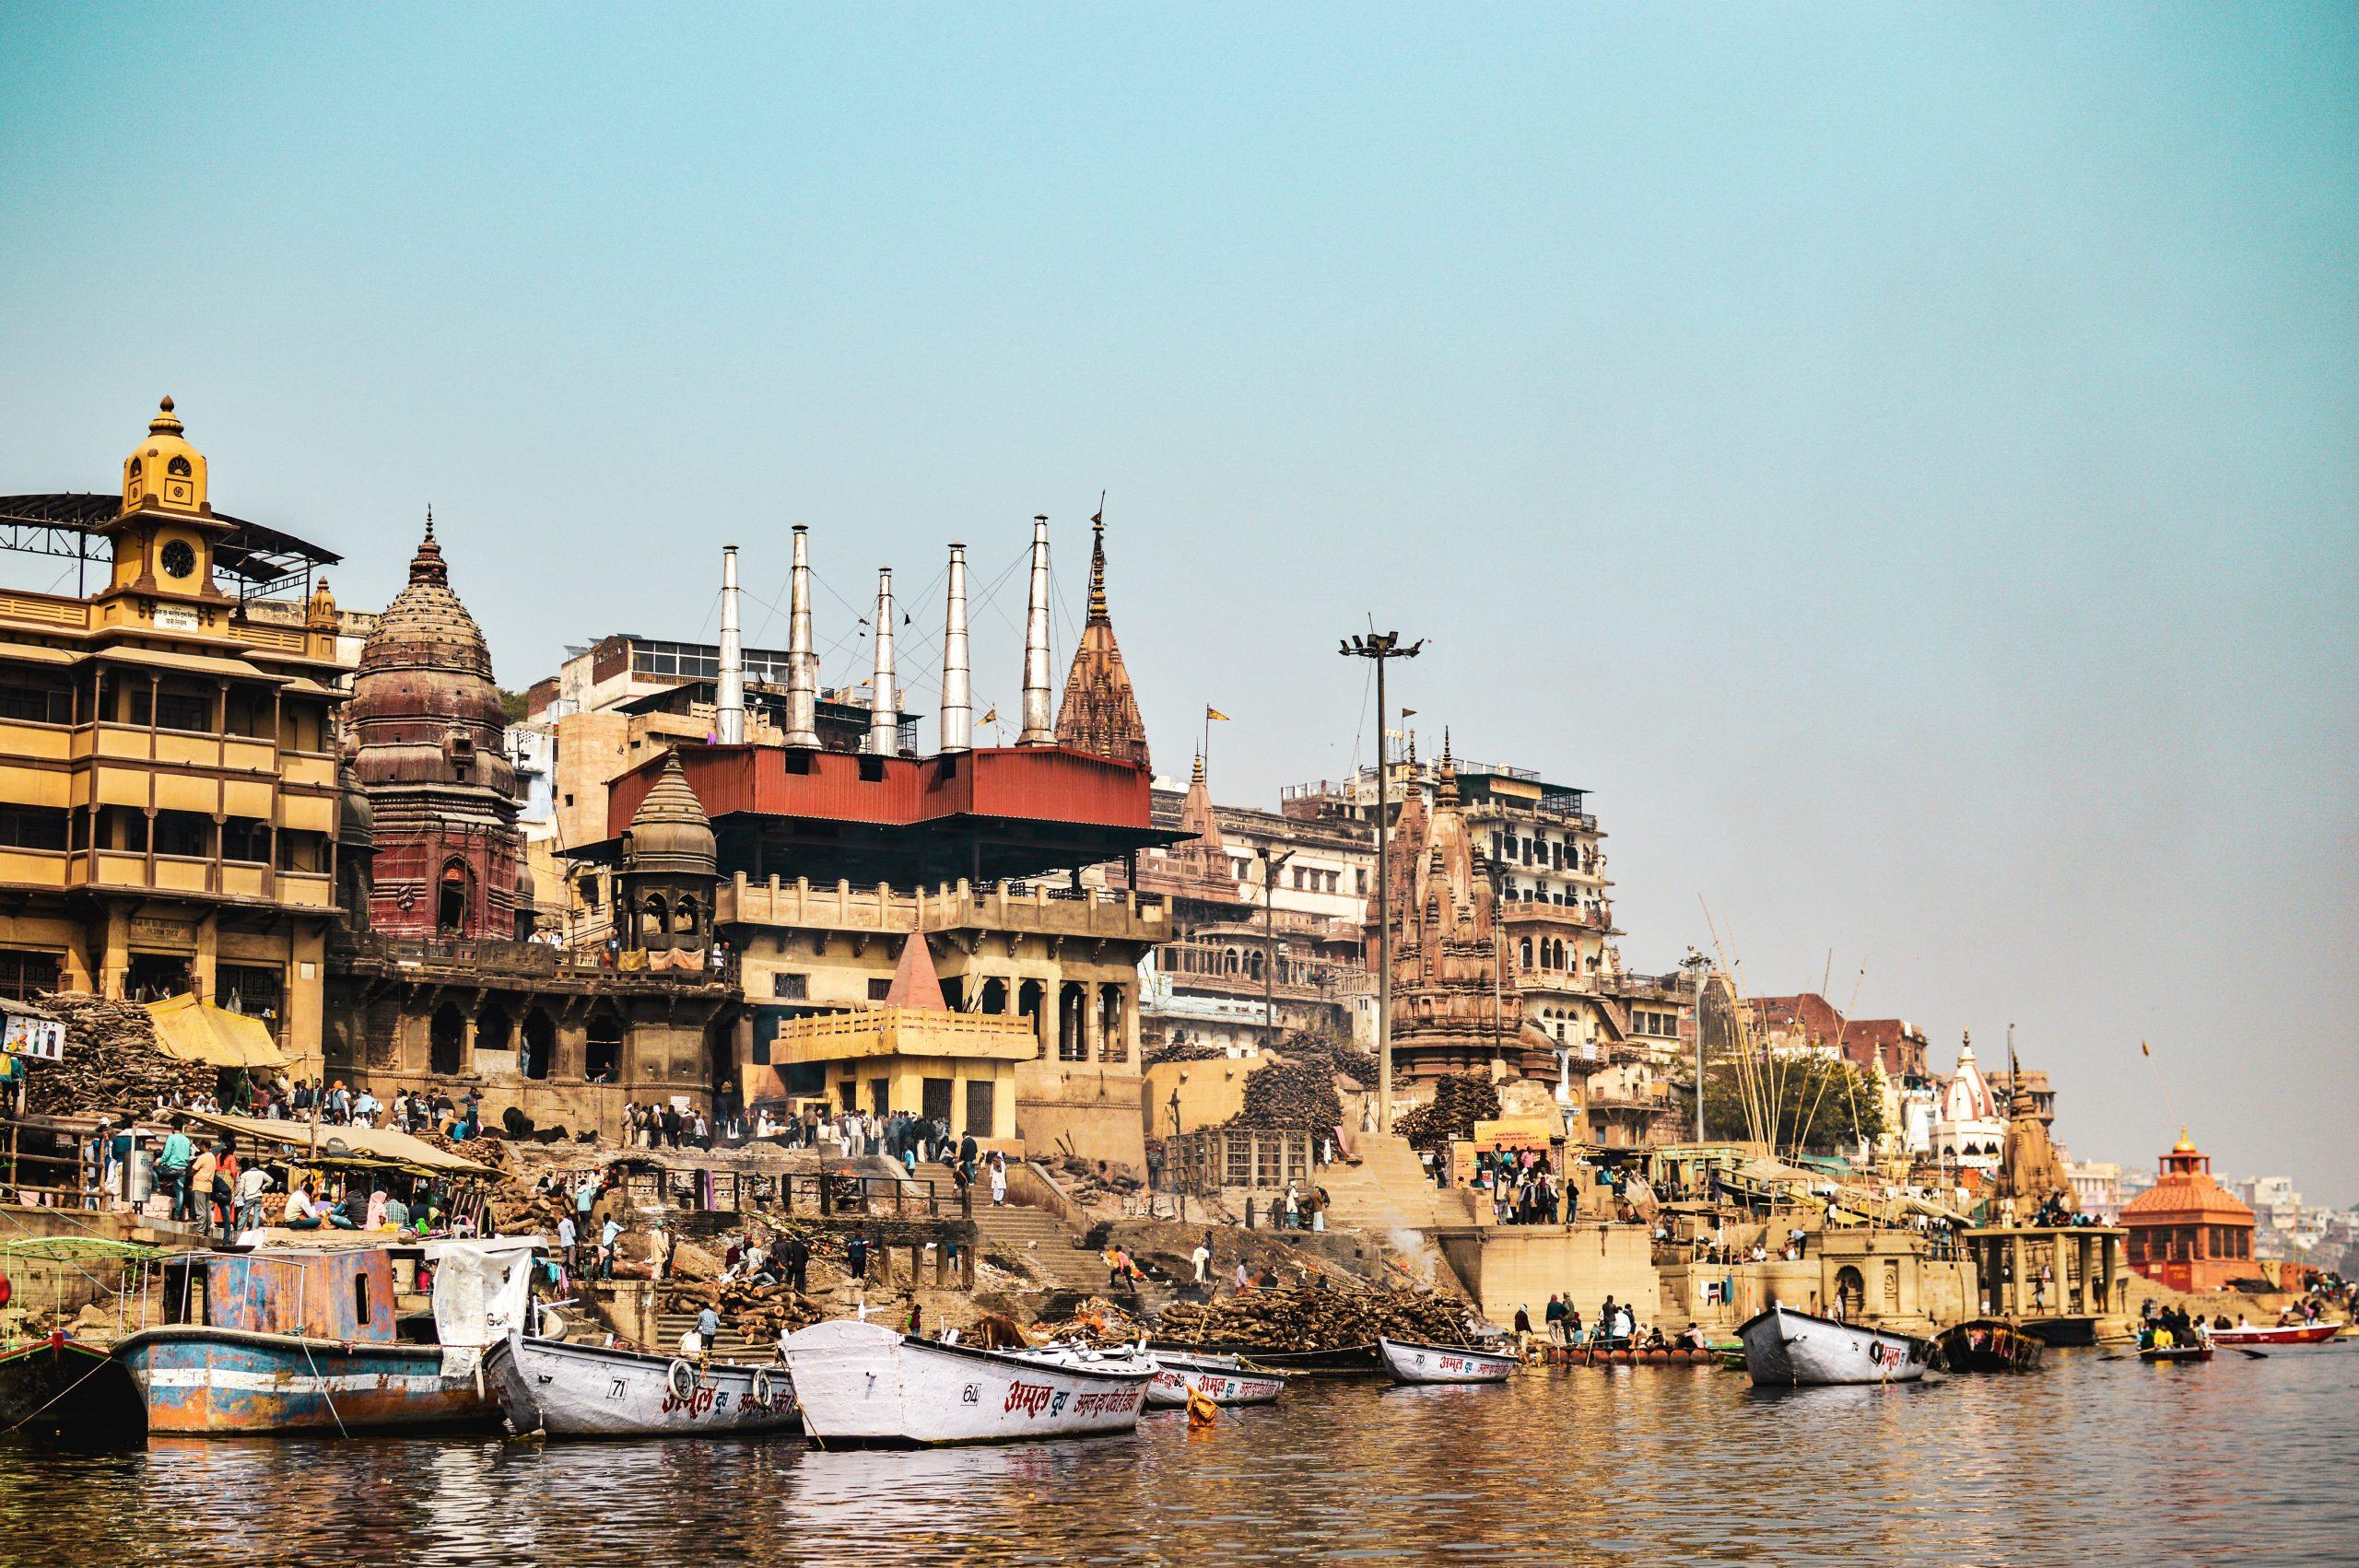 Sacred Ghats of Varanasi